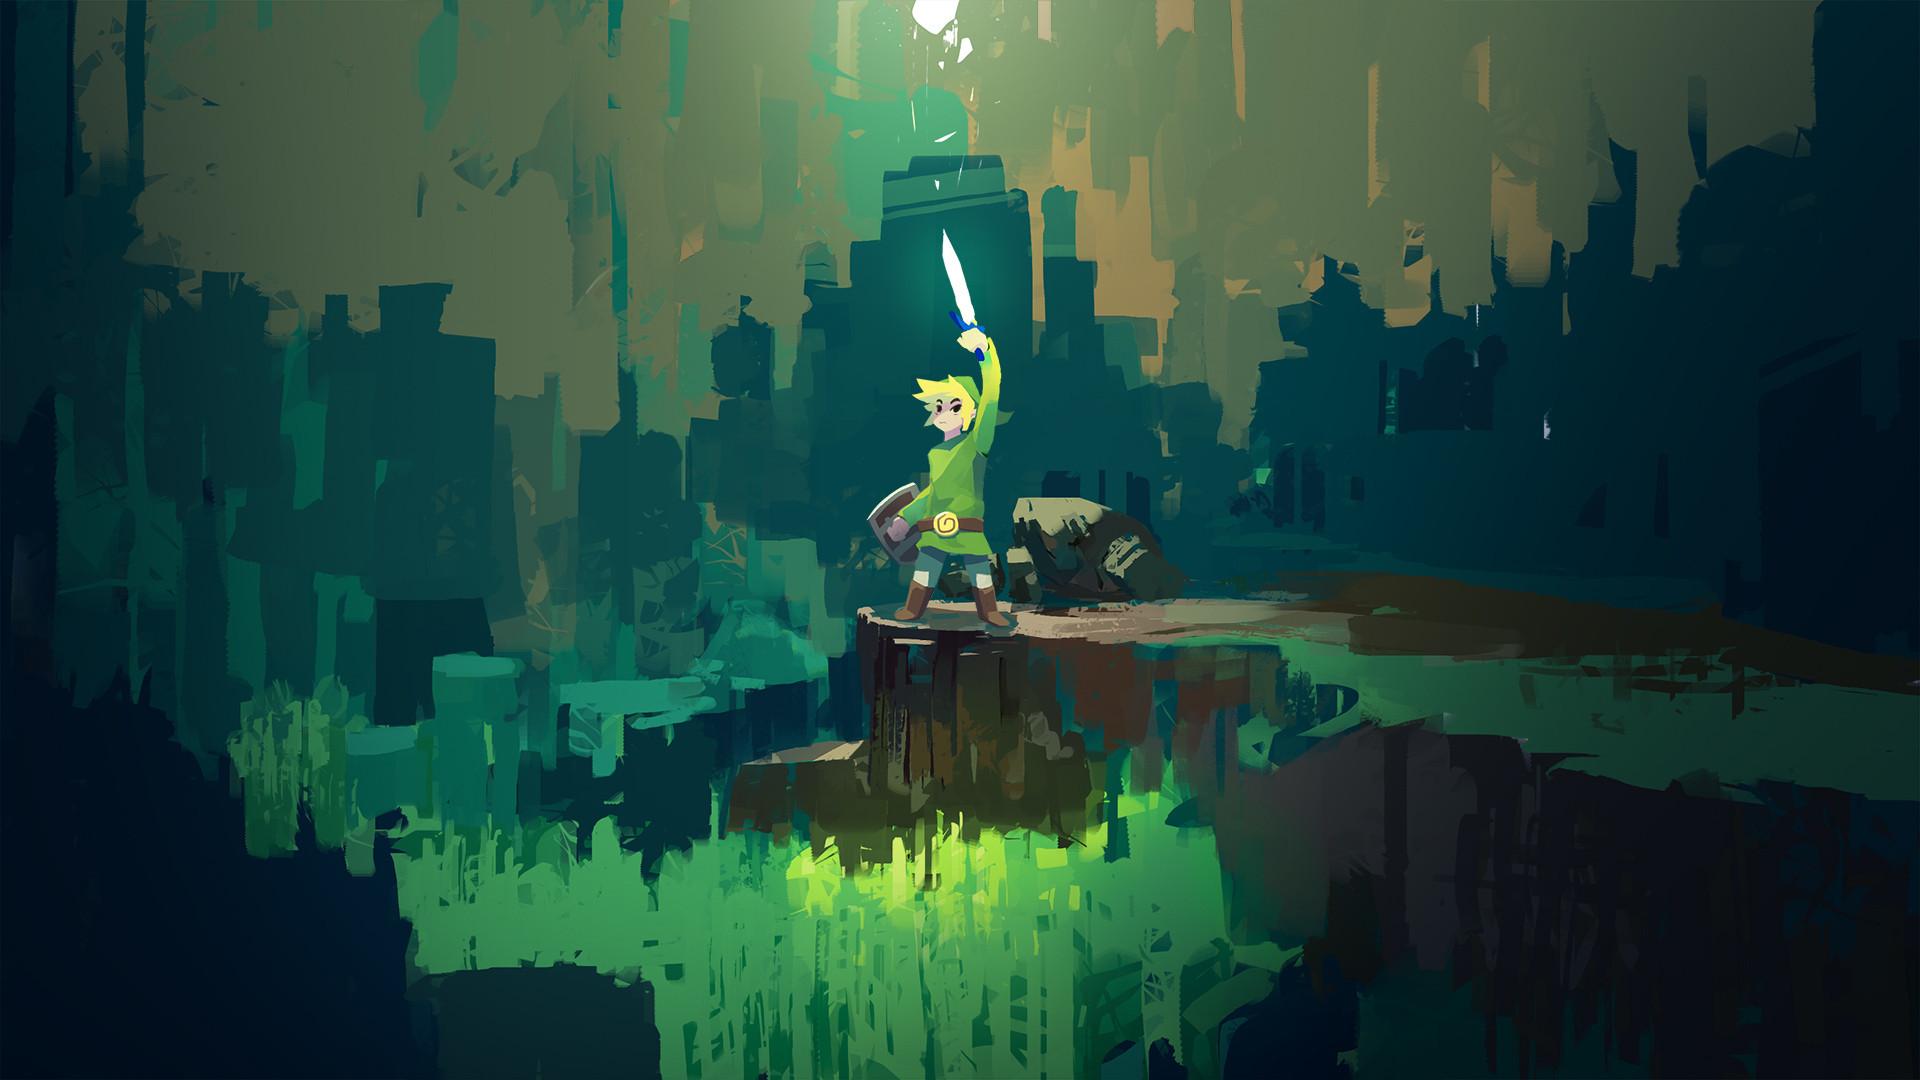 Cool Zelda Backgrounds 77 images 1920x1080